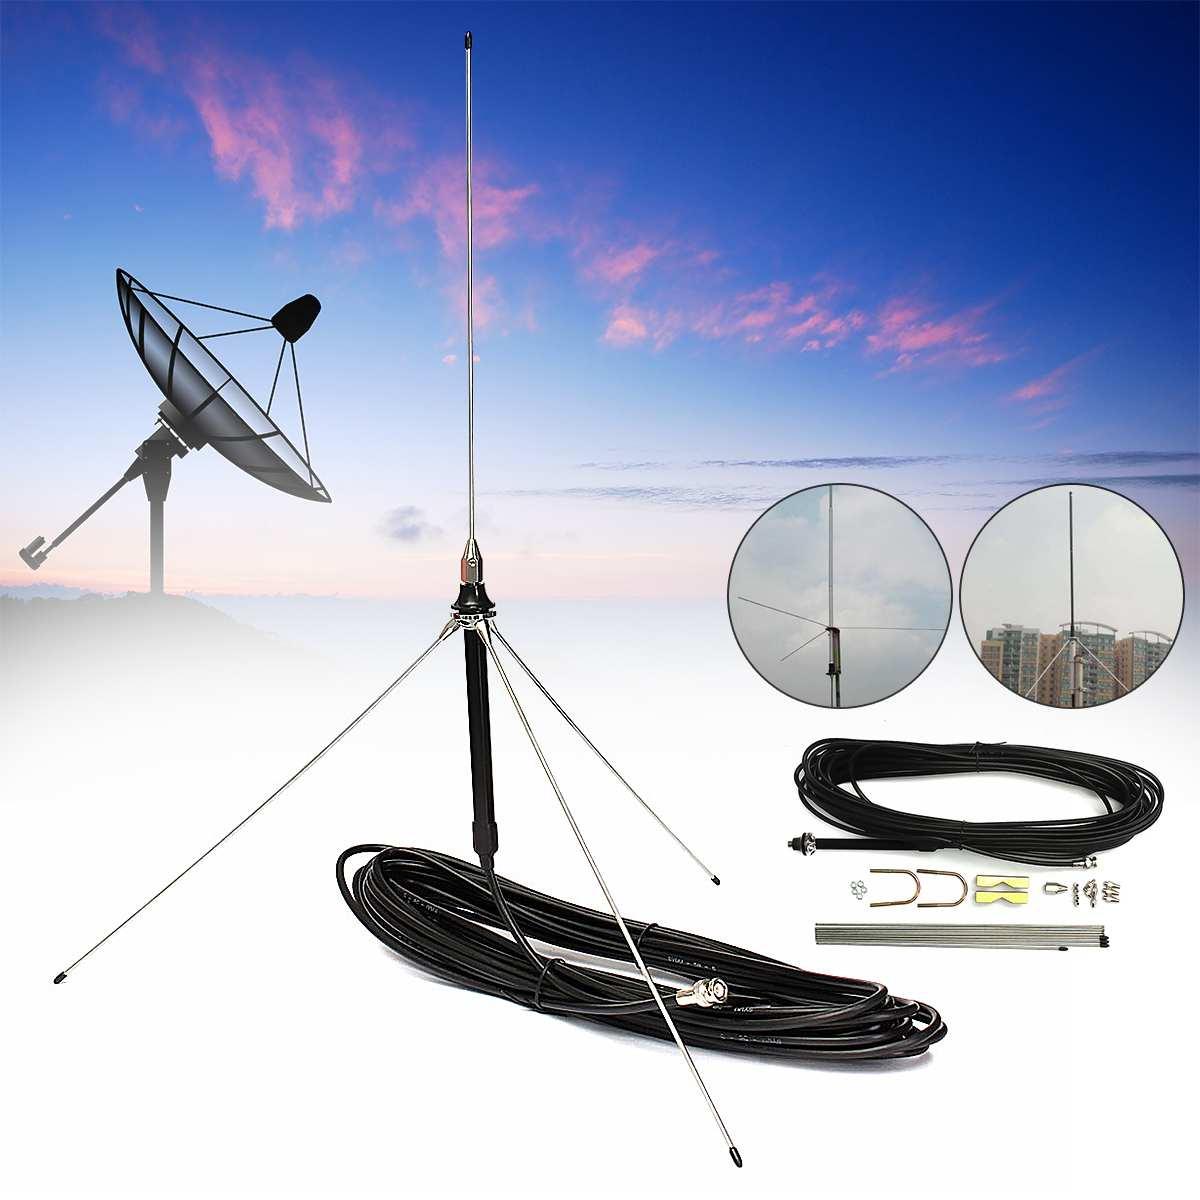 New 15M Cable Powerful 1/4 Wavelength GP Antenna For 0.5-30W Watt FM Transmitter